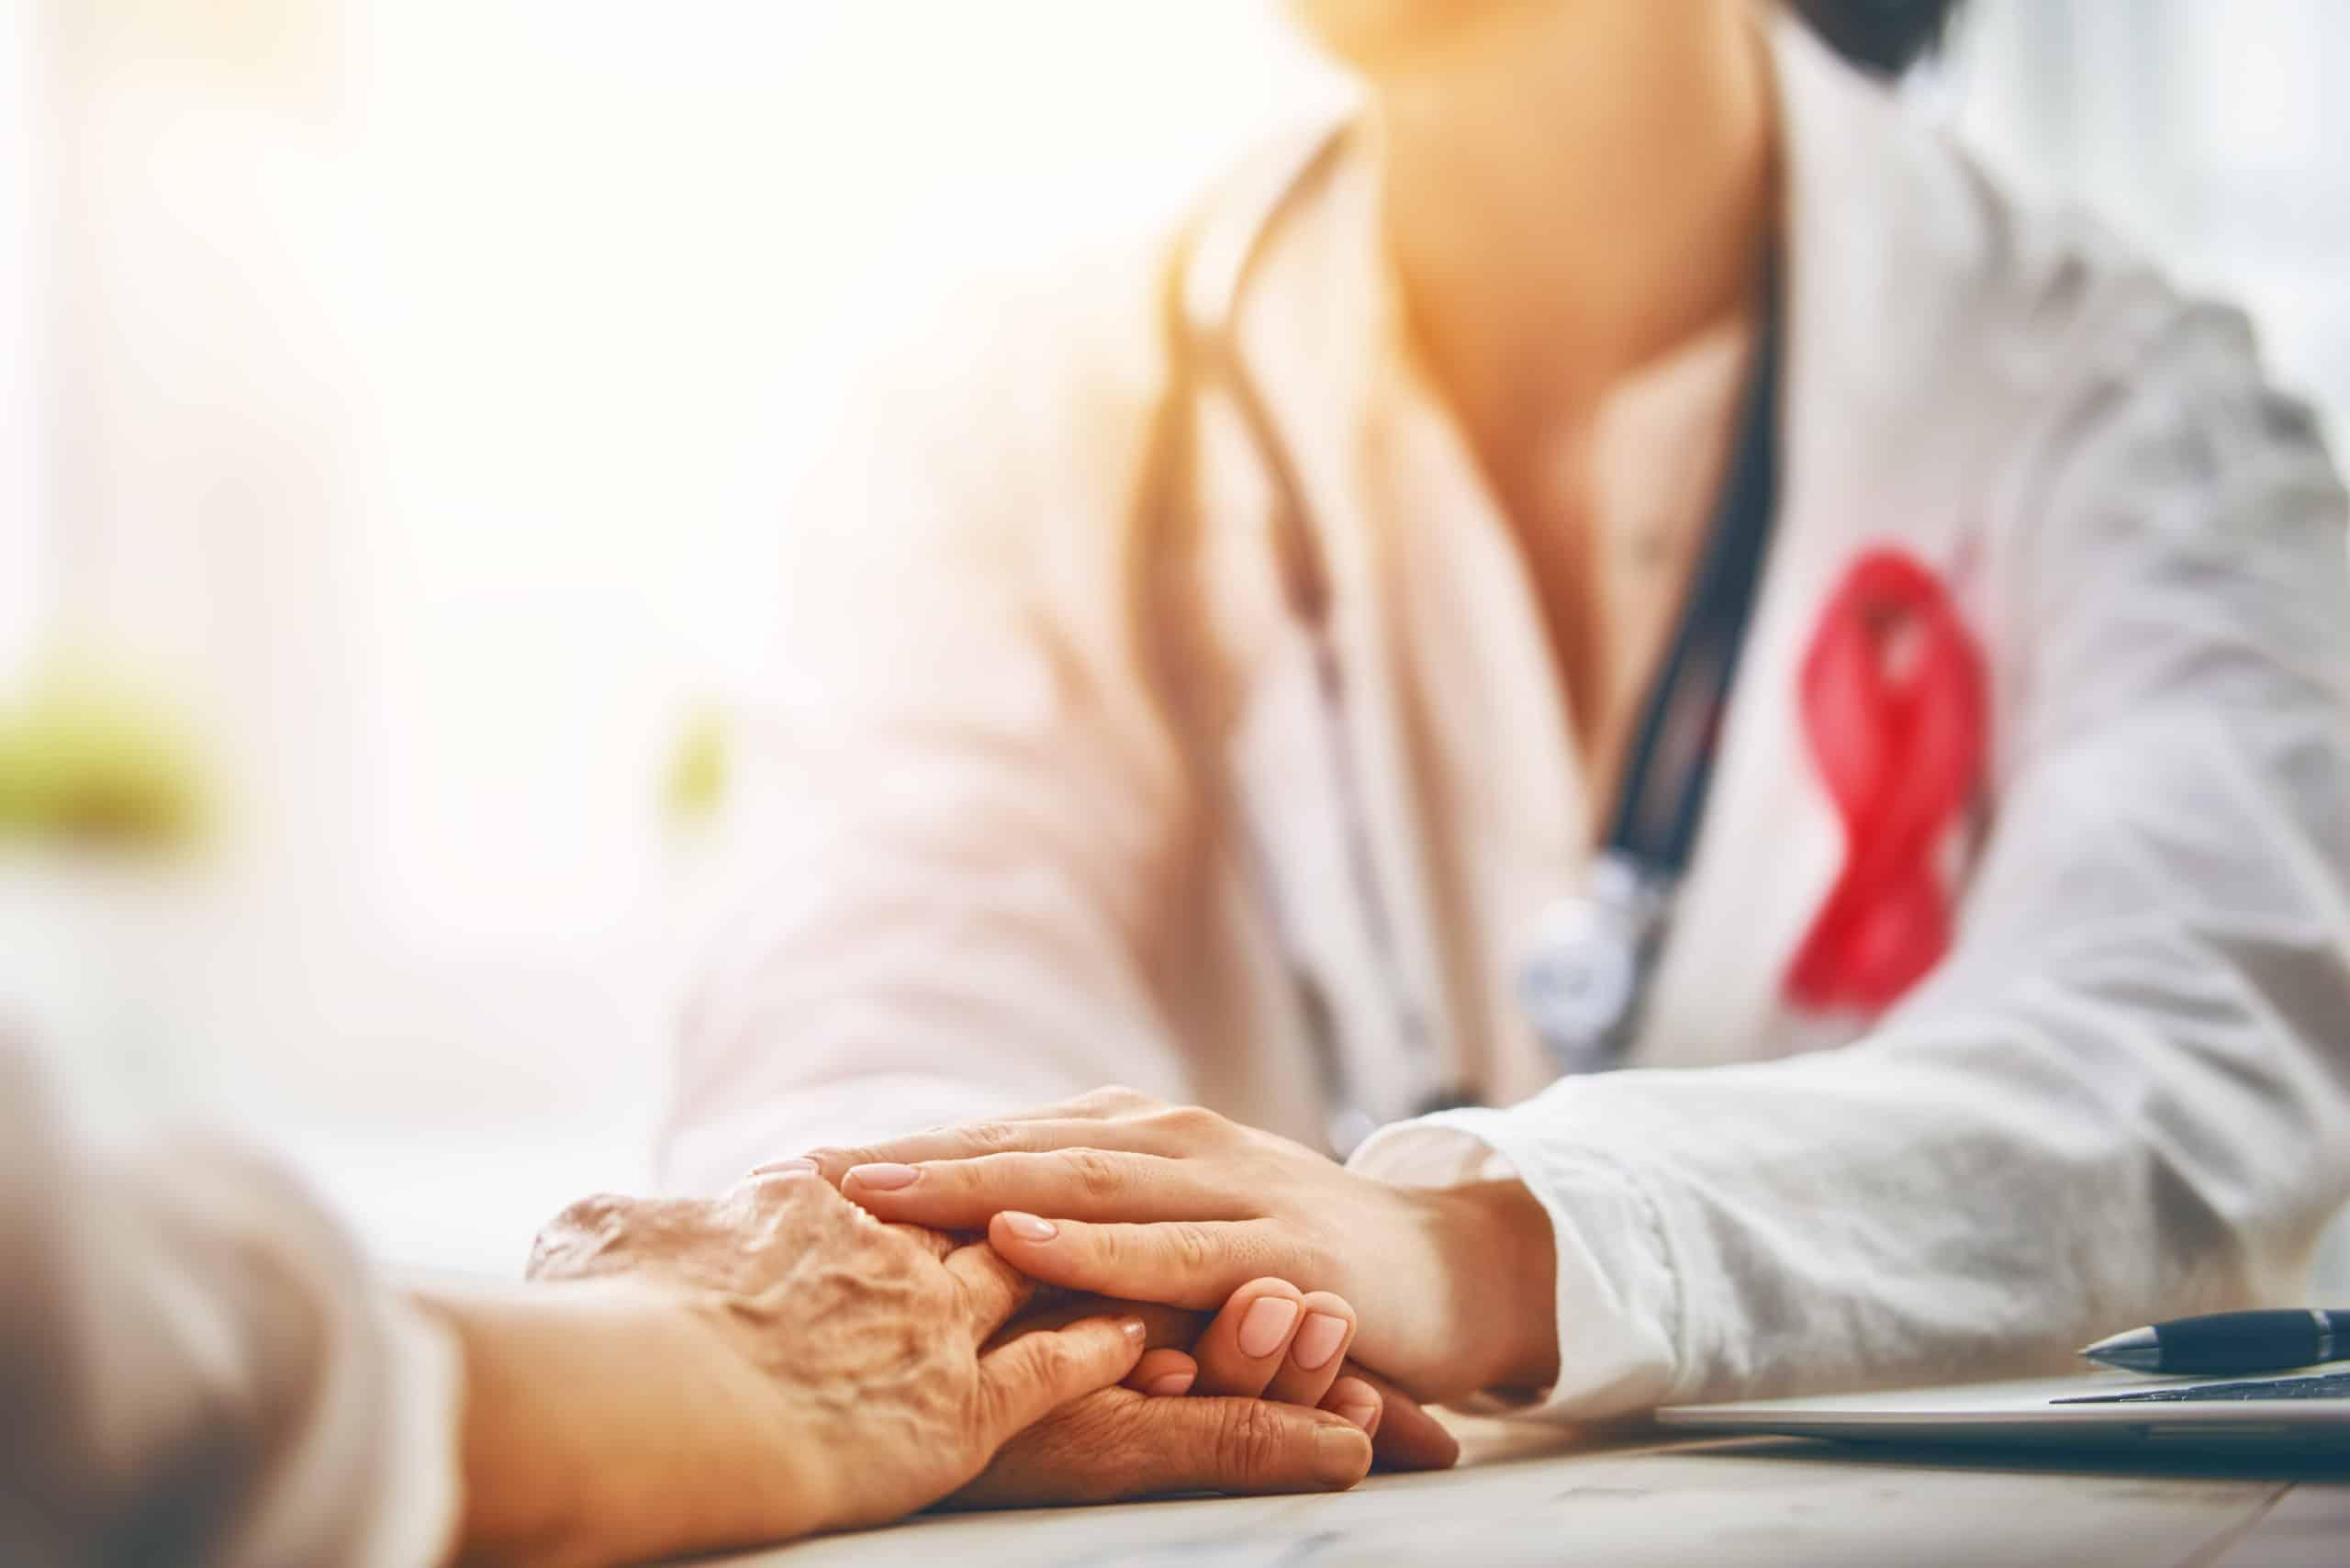 inbound medic online reputation management medical practice marketing companies